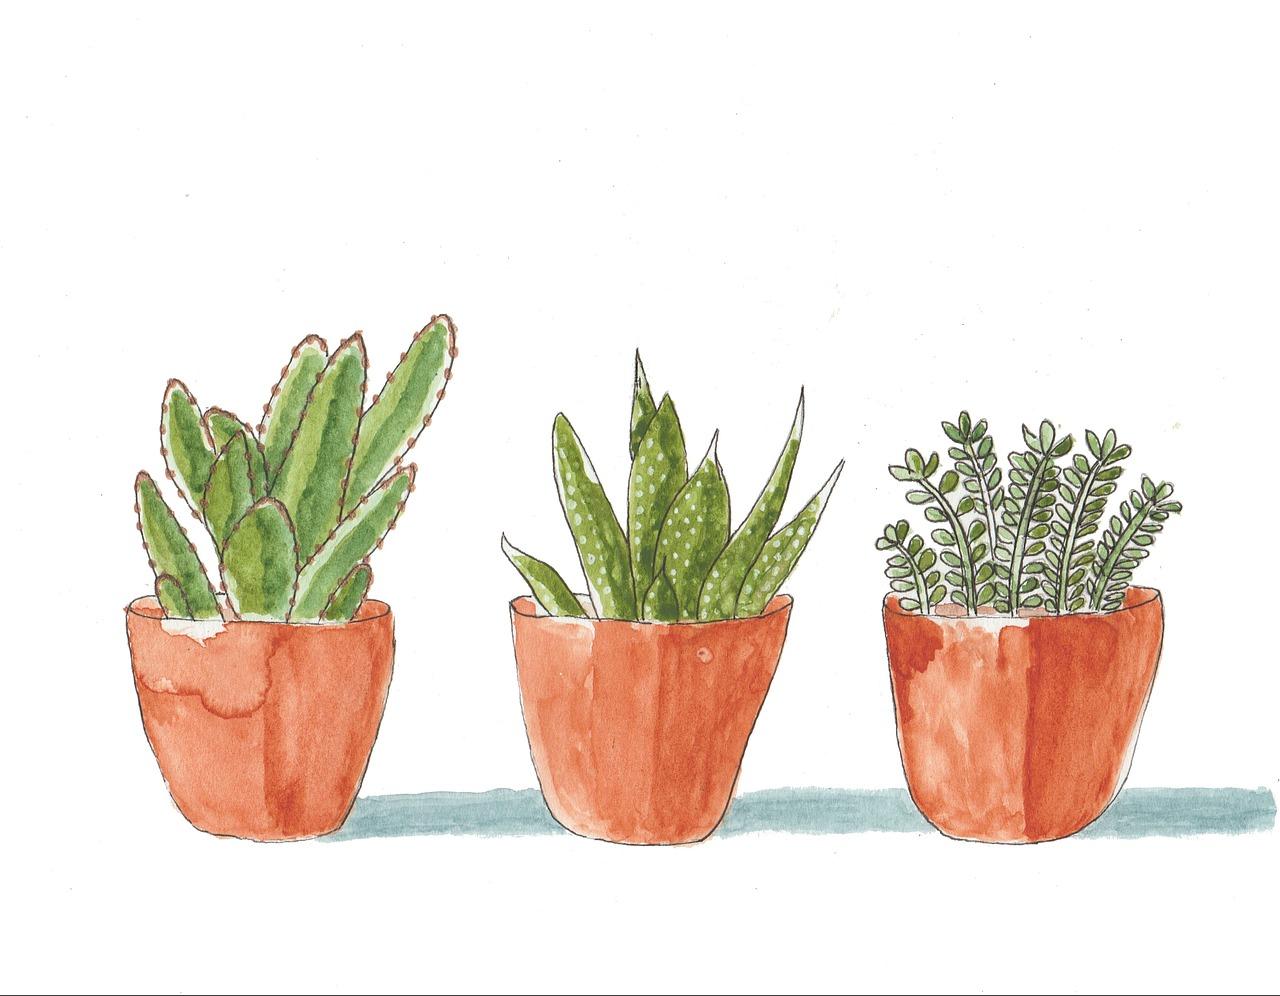 Succulents 2337197 1280